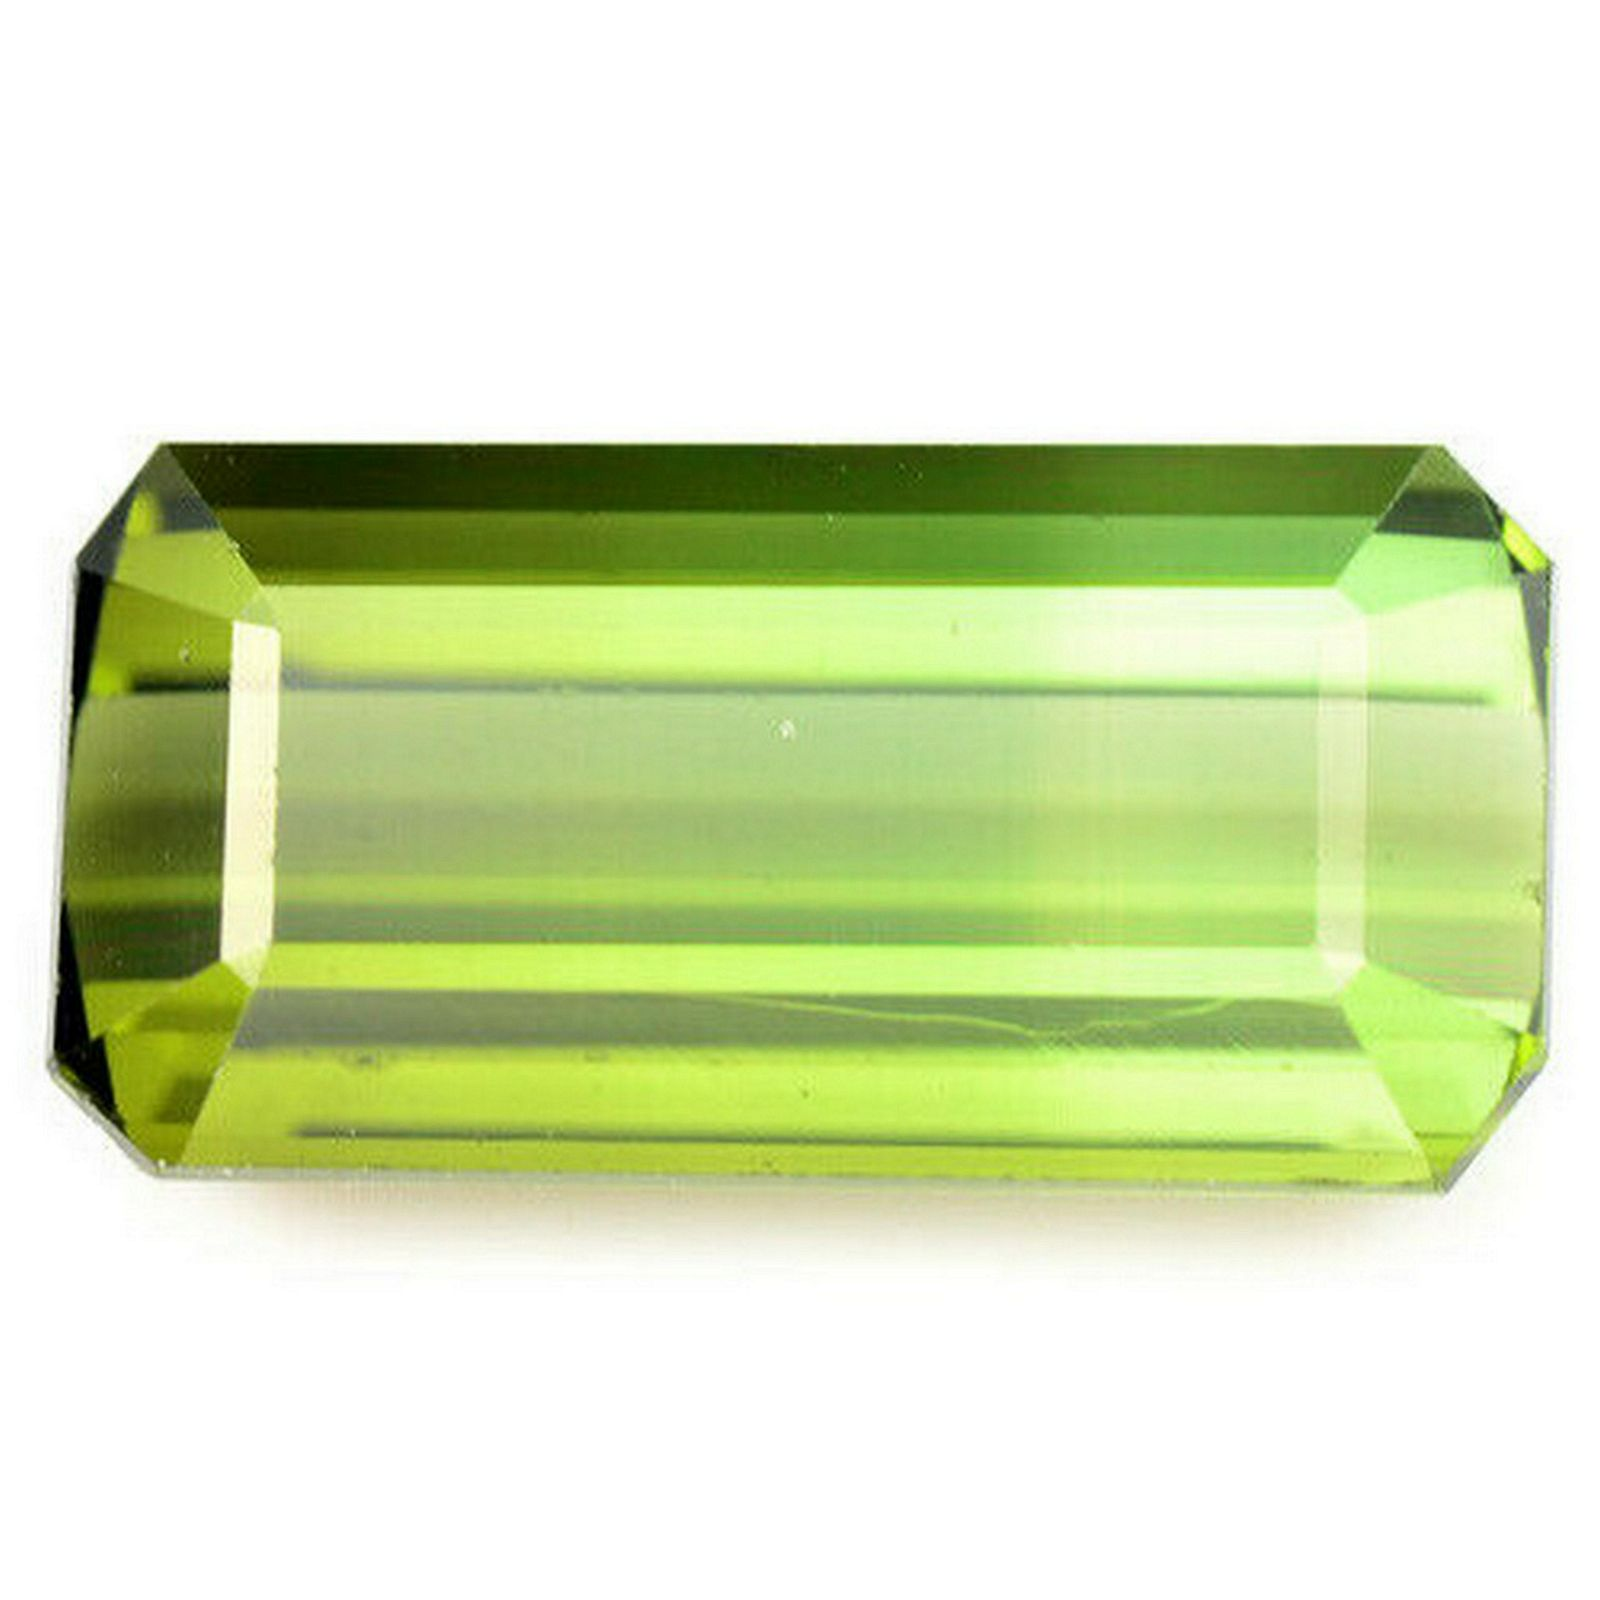 10.49 ct natural AIG certified teal green tourmaline